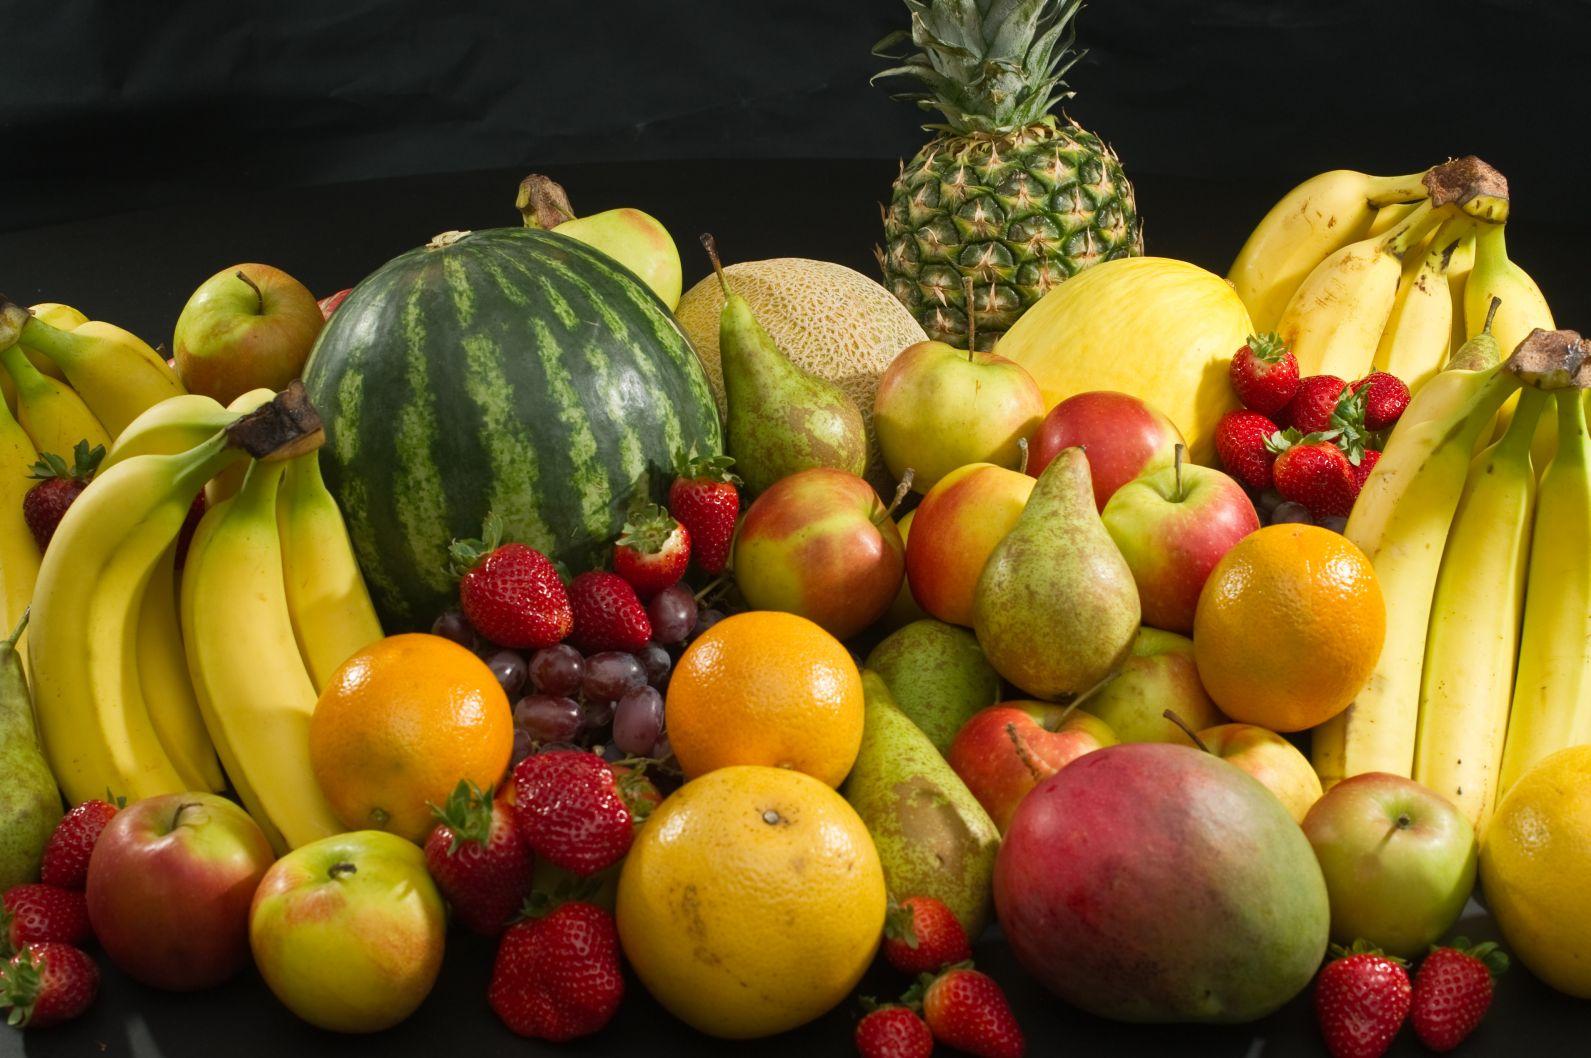 Fruita variada